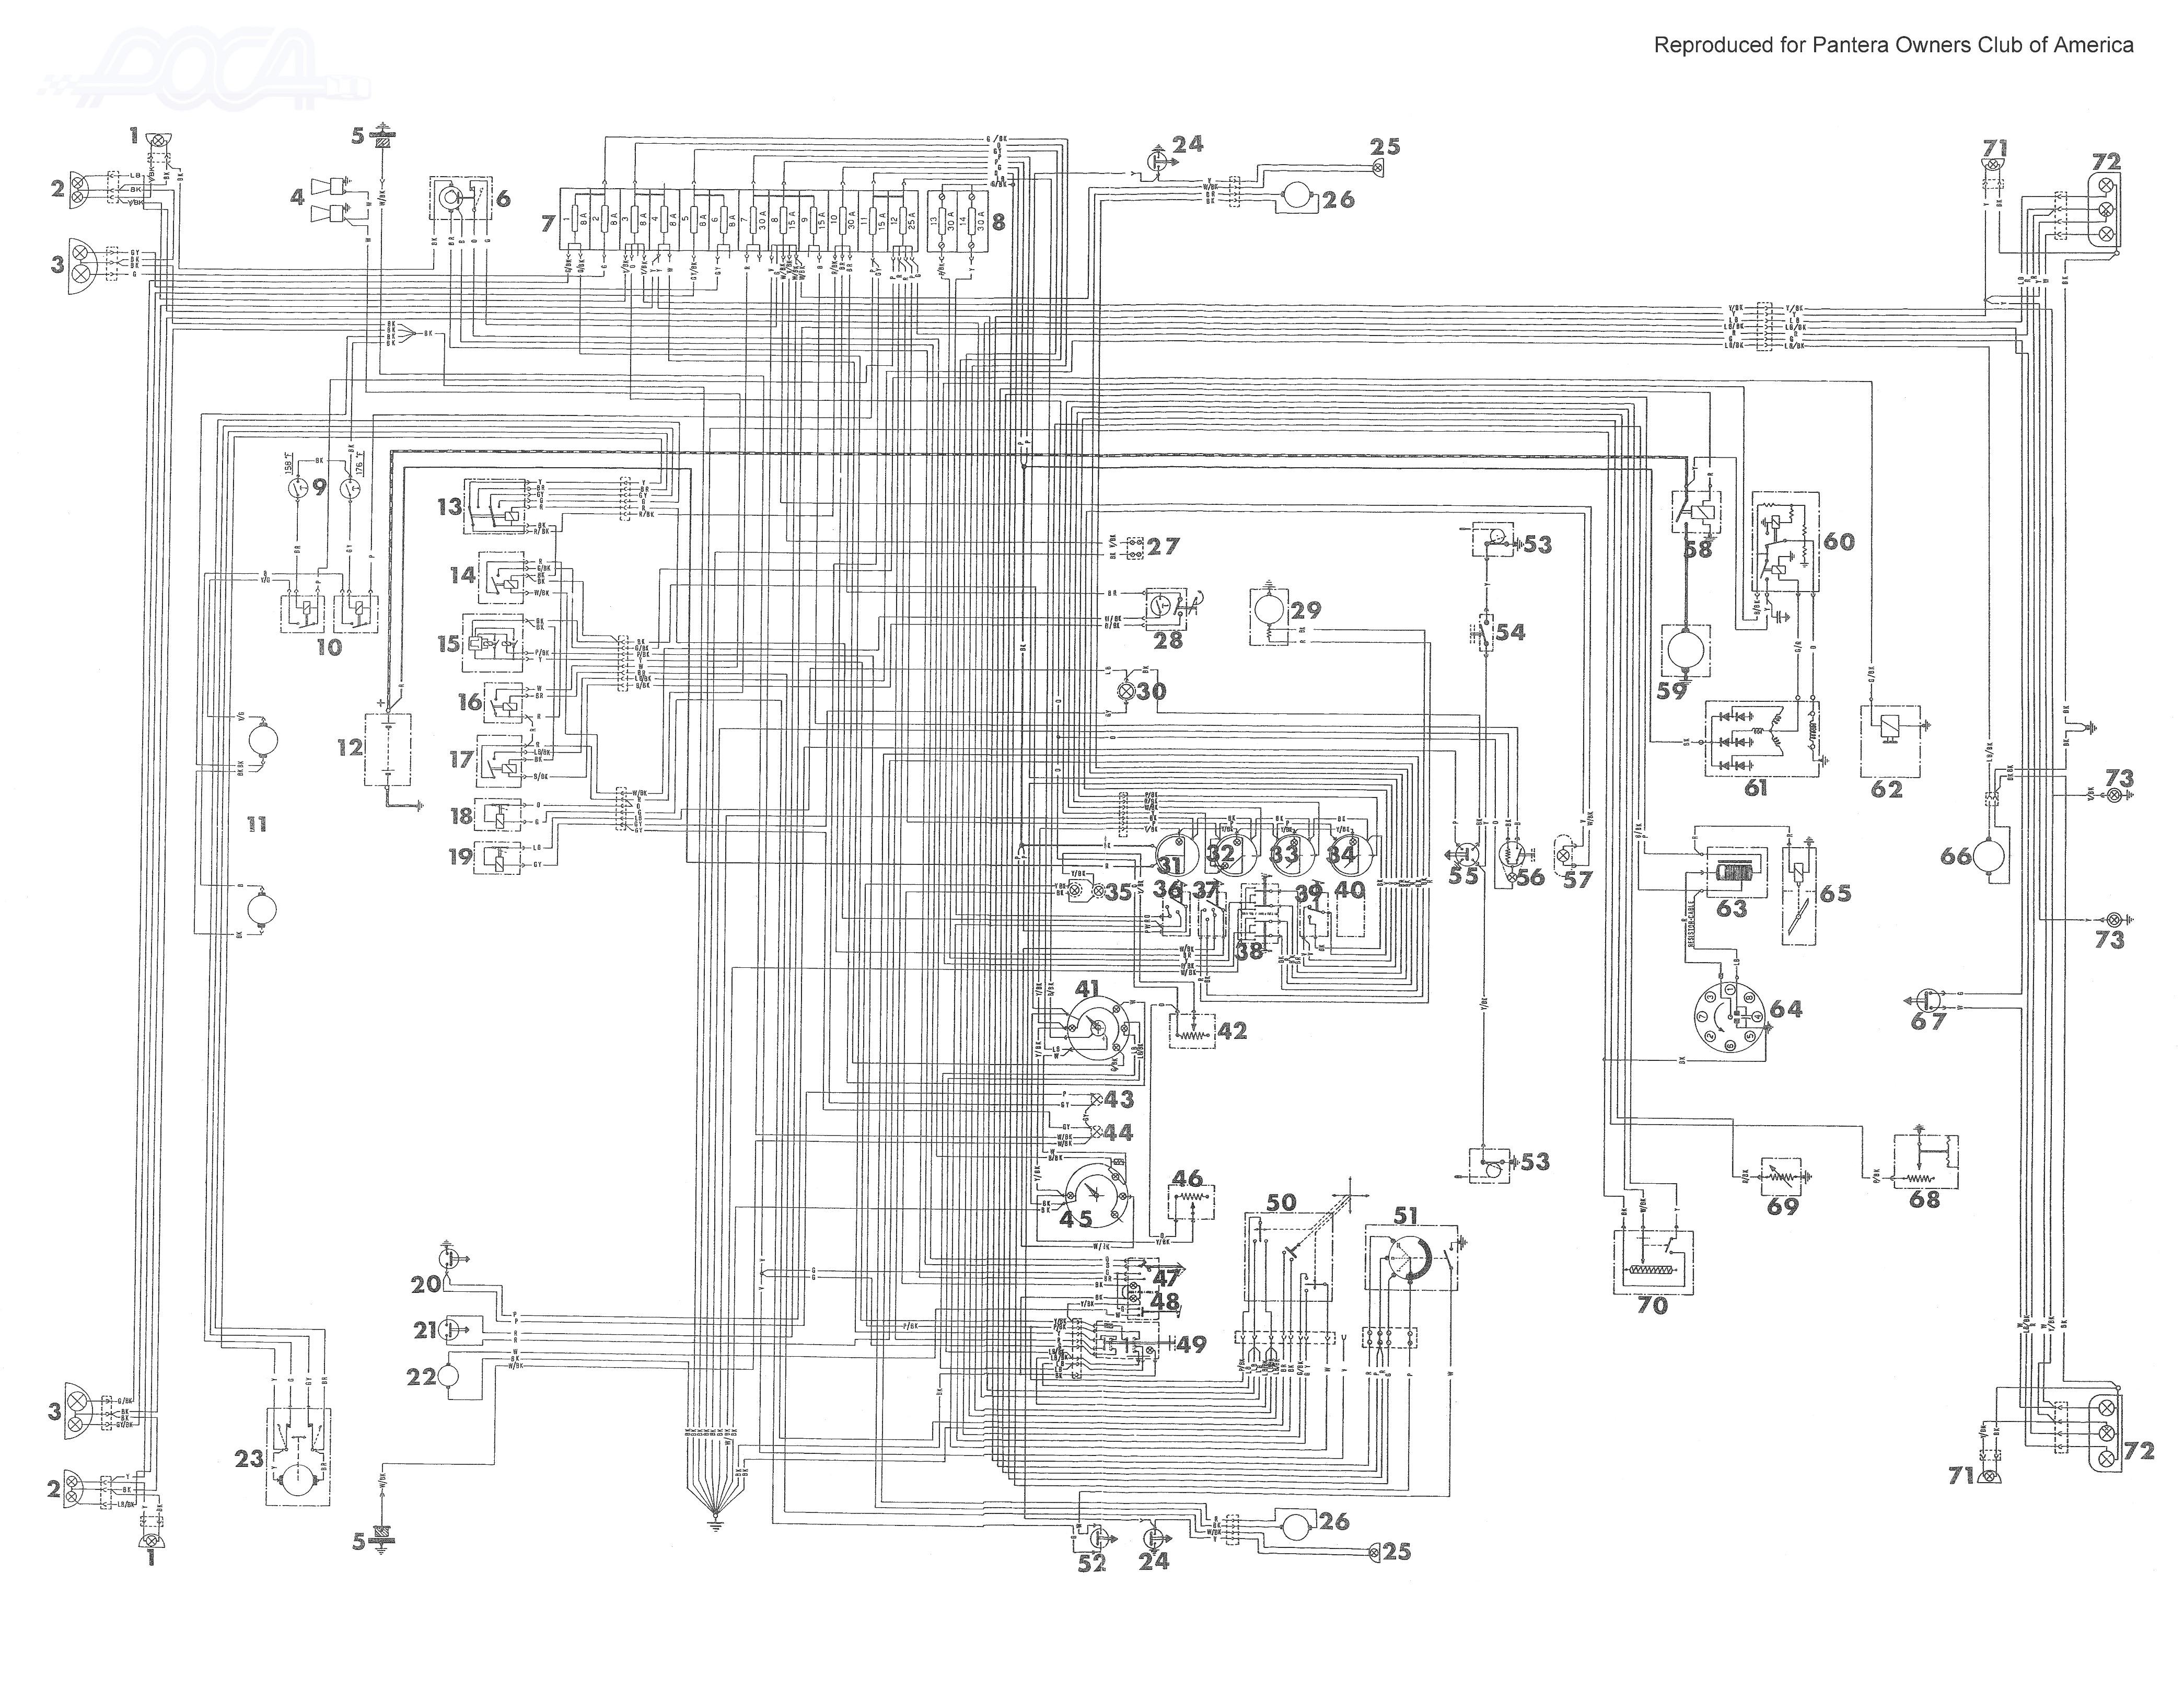 de tomaso - car pdf manual, wiring diagram & fault codes dtc  automotive-manuals.net